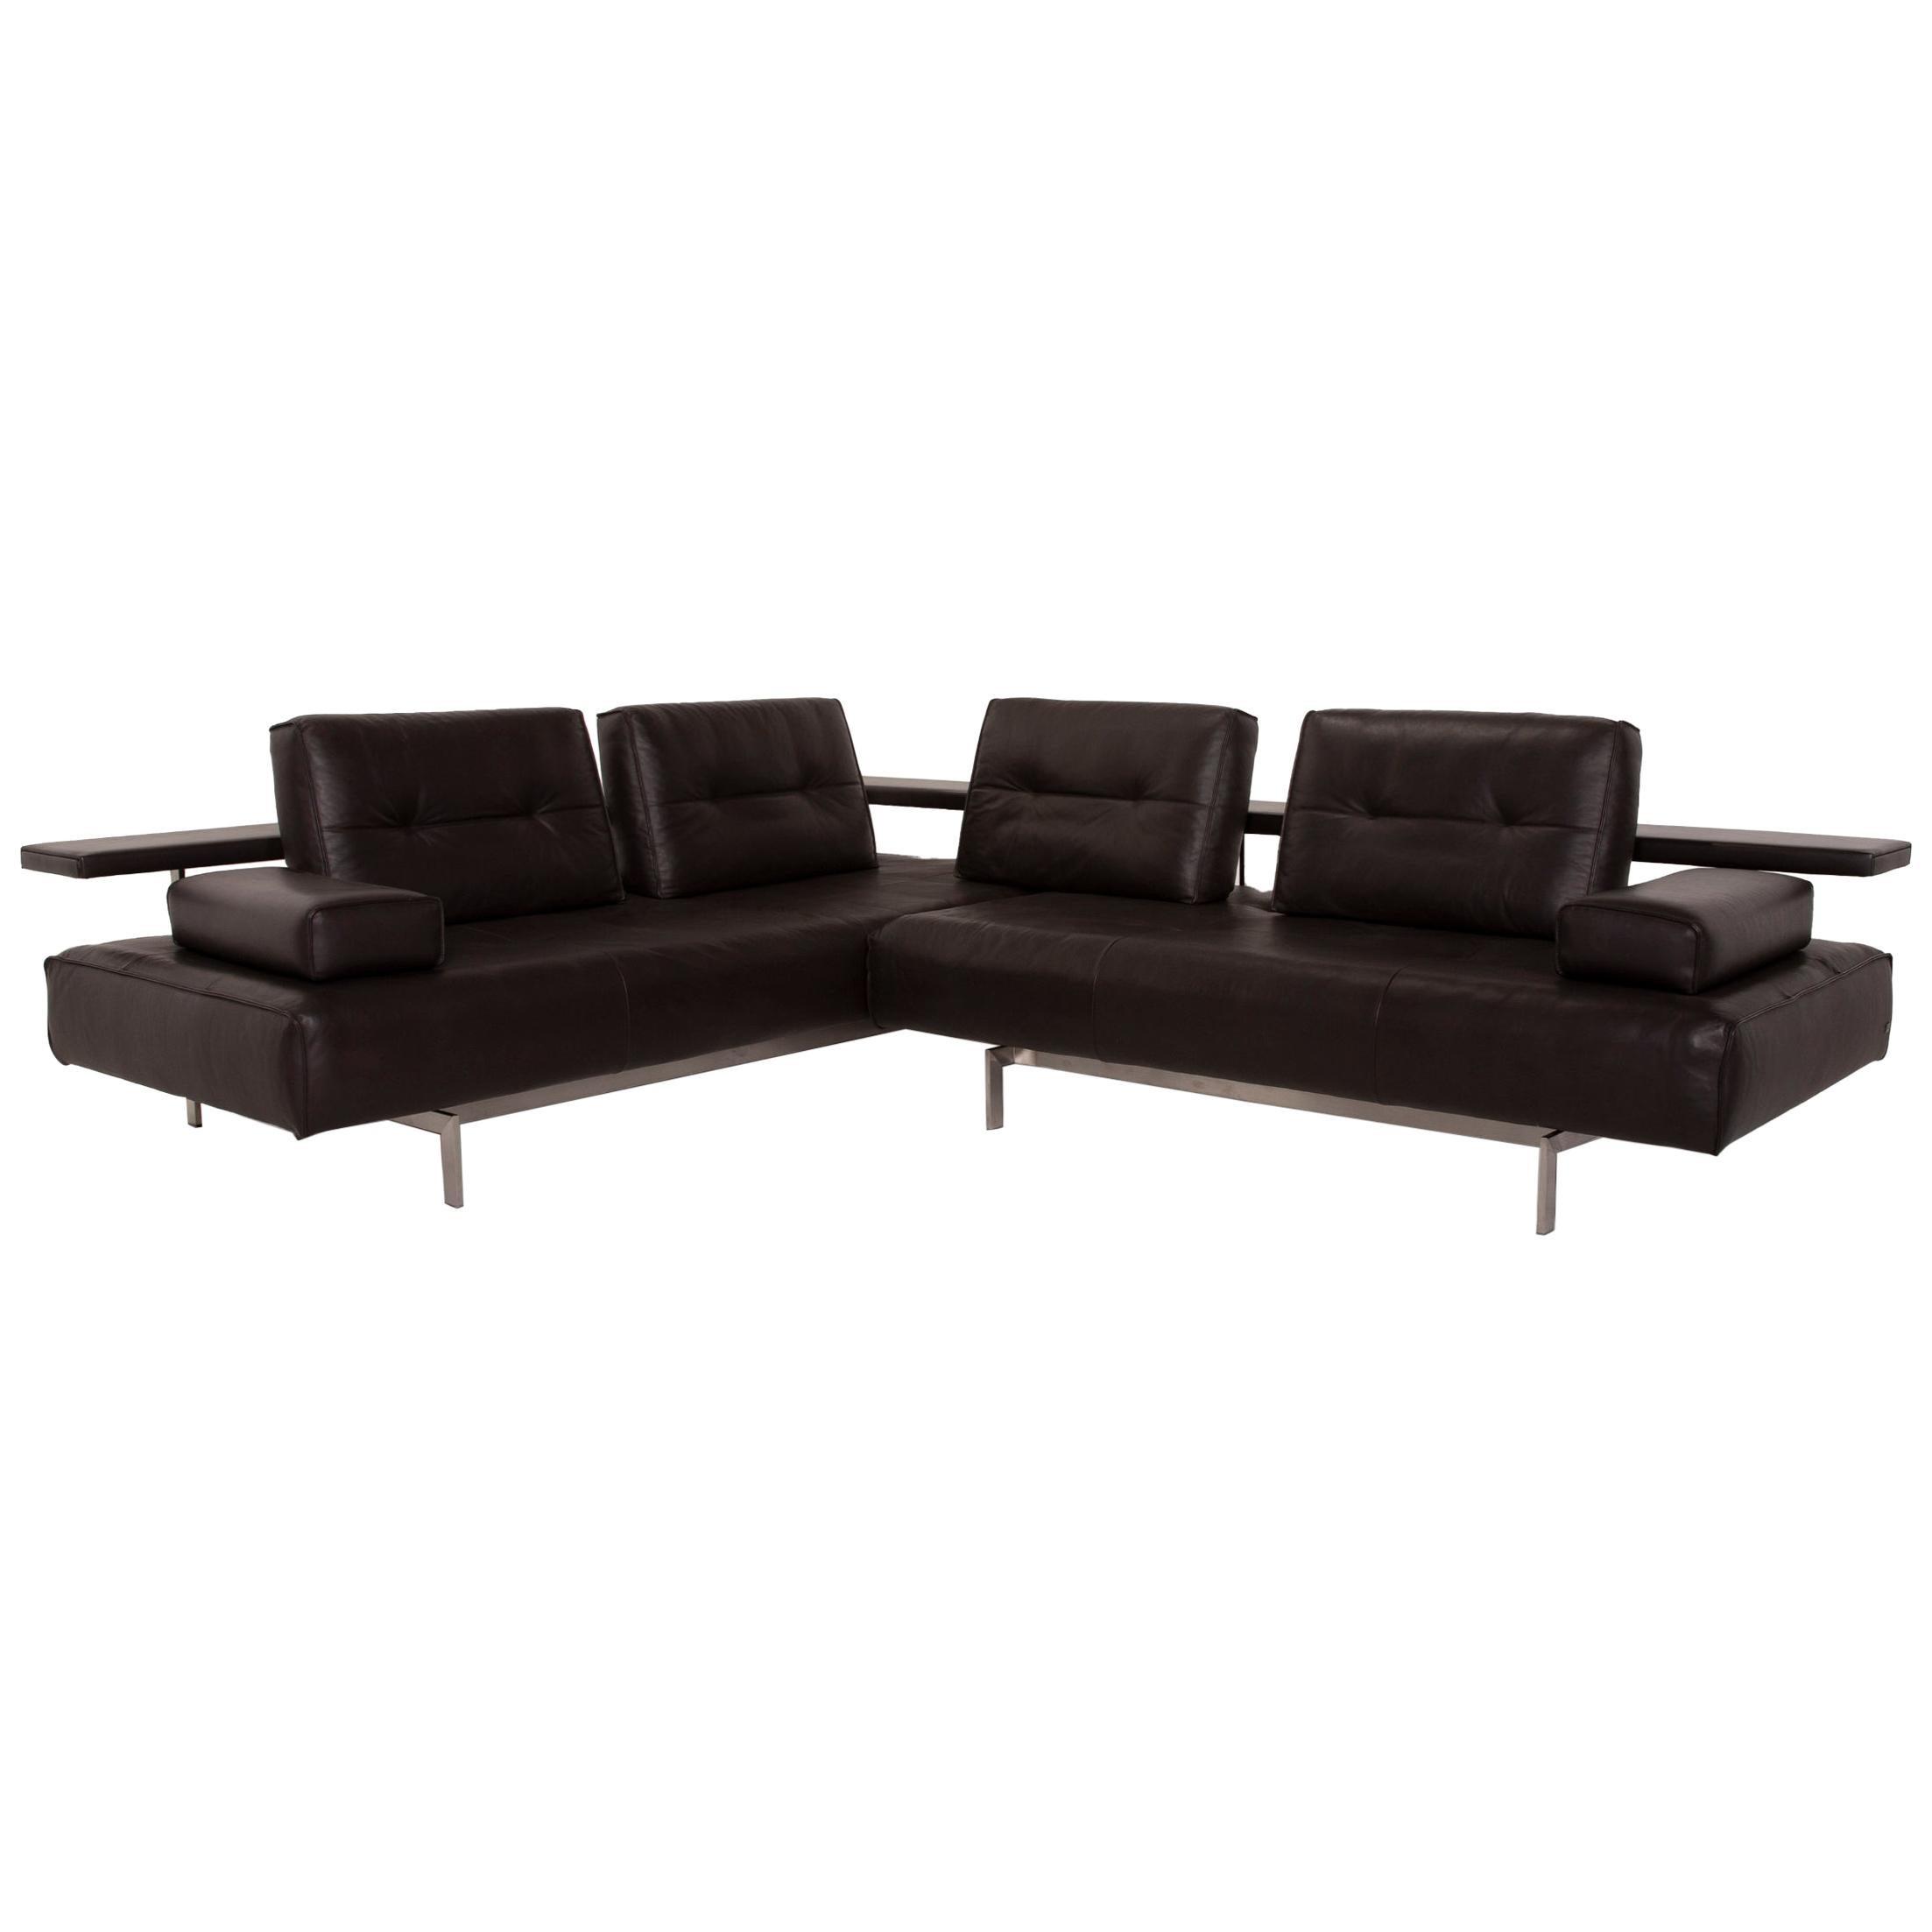 Rolf Benz Dono Leather Sofa Brown Corner Sofa Function Dark Brown